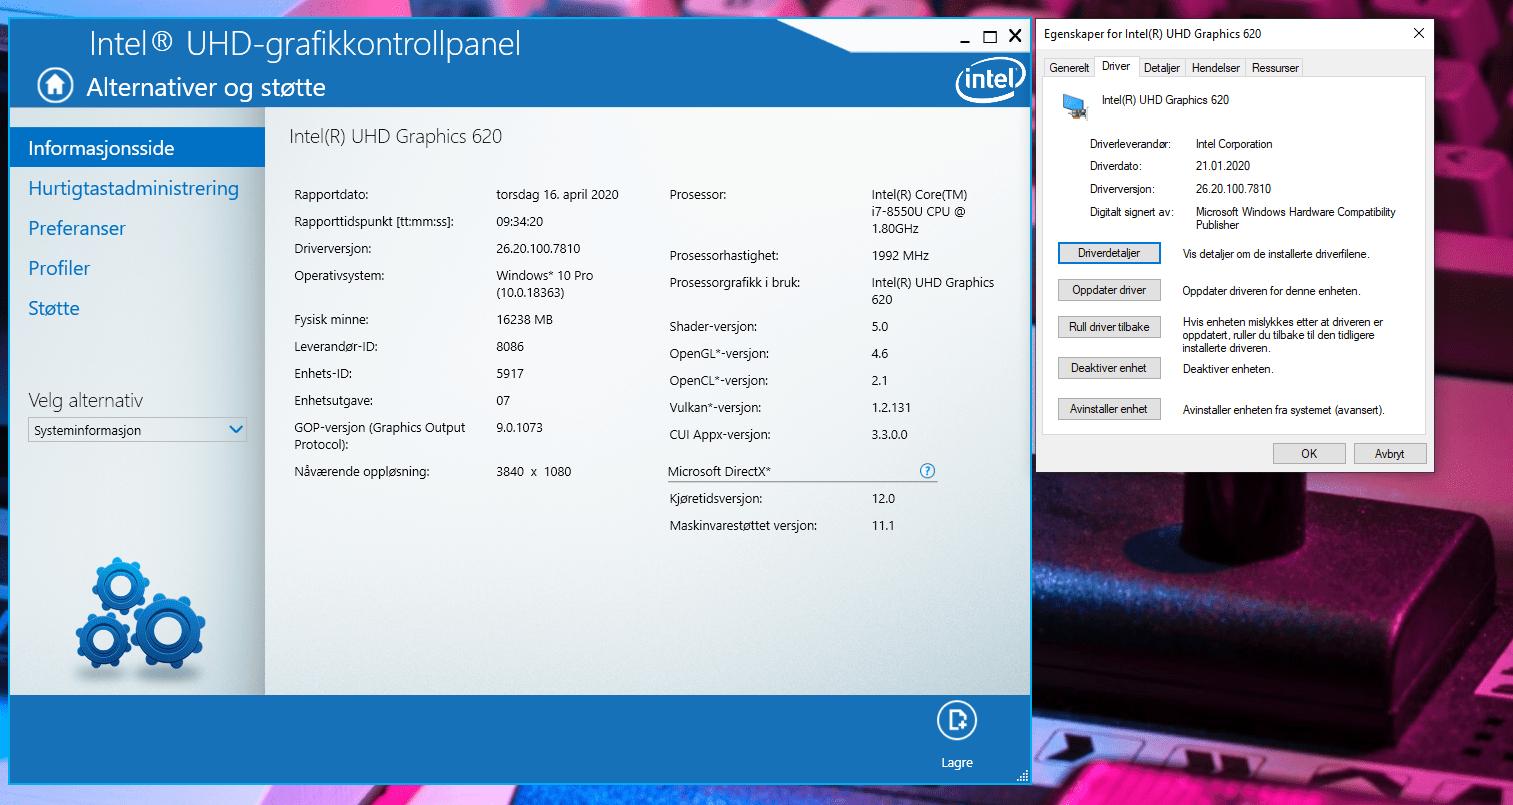 Intel UHD Graphics 620 version 26.20.100.7810 can't handle 5120 x 1440 resolution-English Community